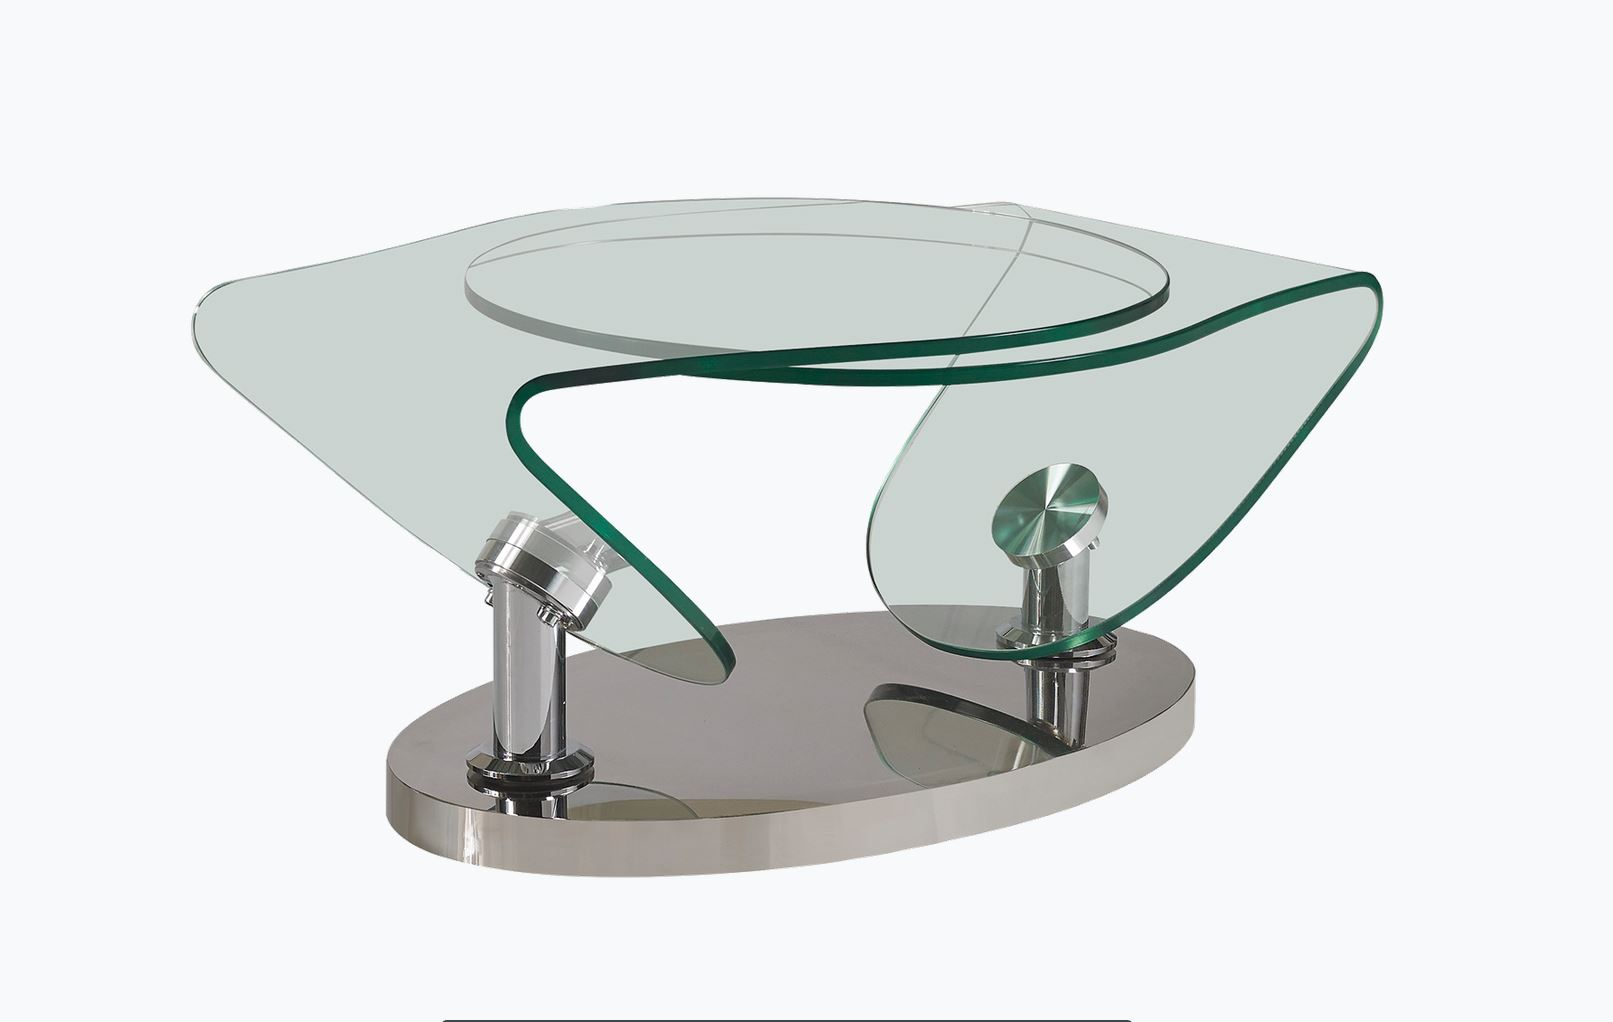 Table basse verre design original mod le synchro chateau d 39 ax marseille - Modele table basse ...